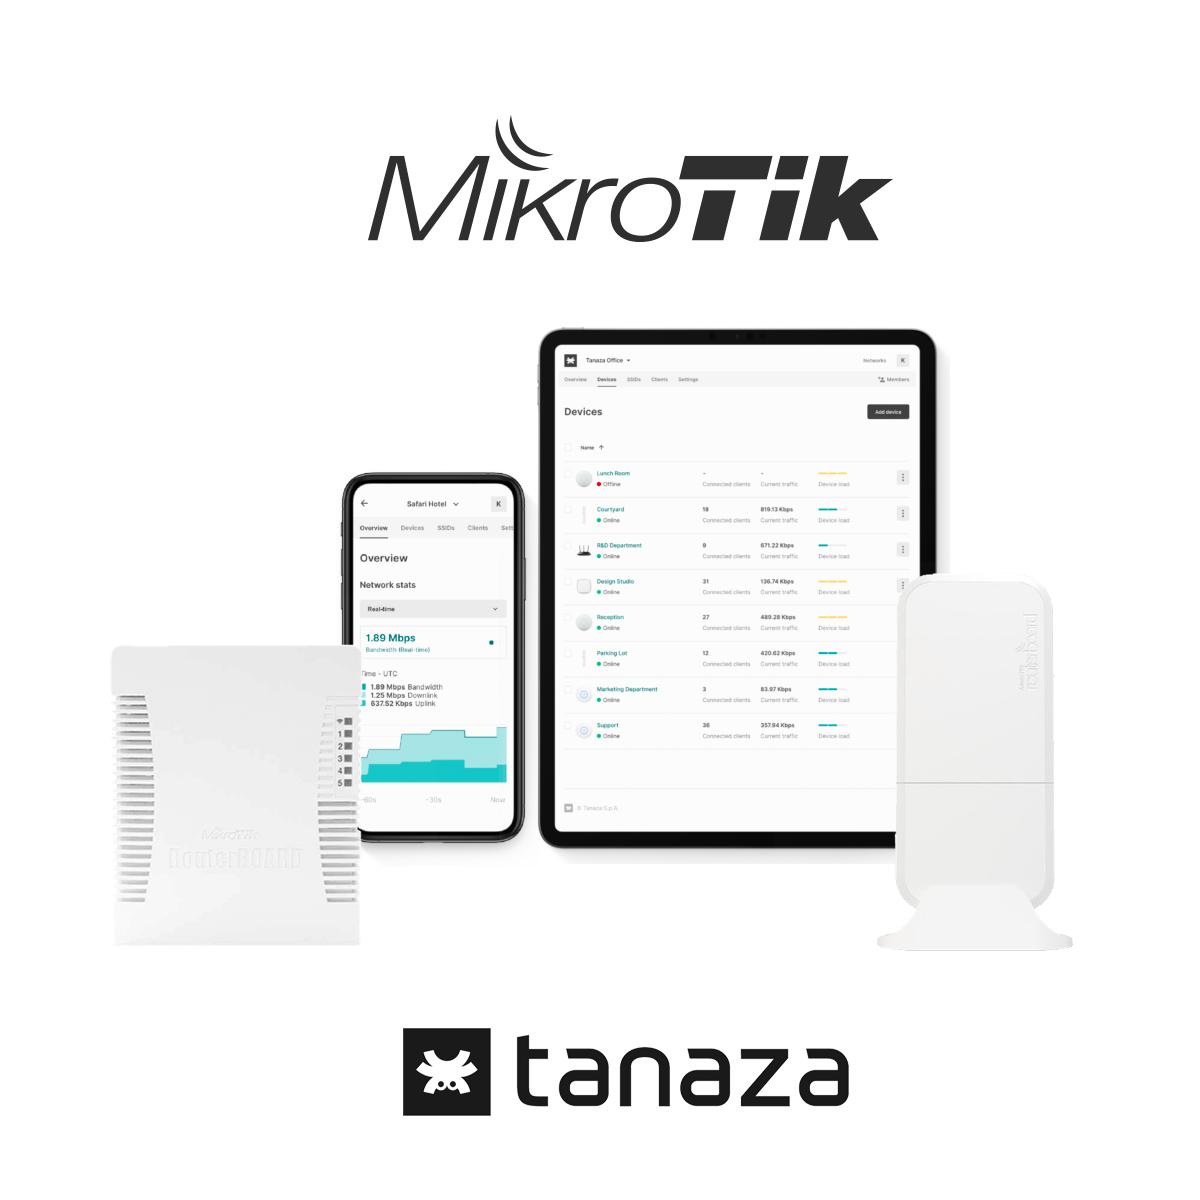 Manage Mikrotik Devices with Tanaza